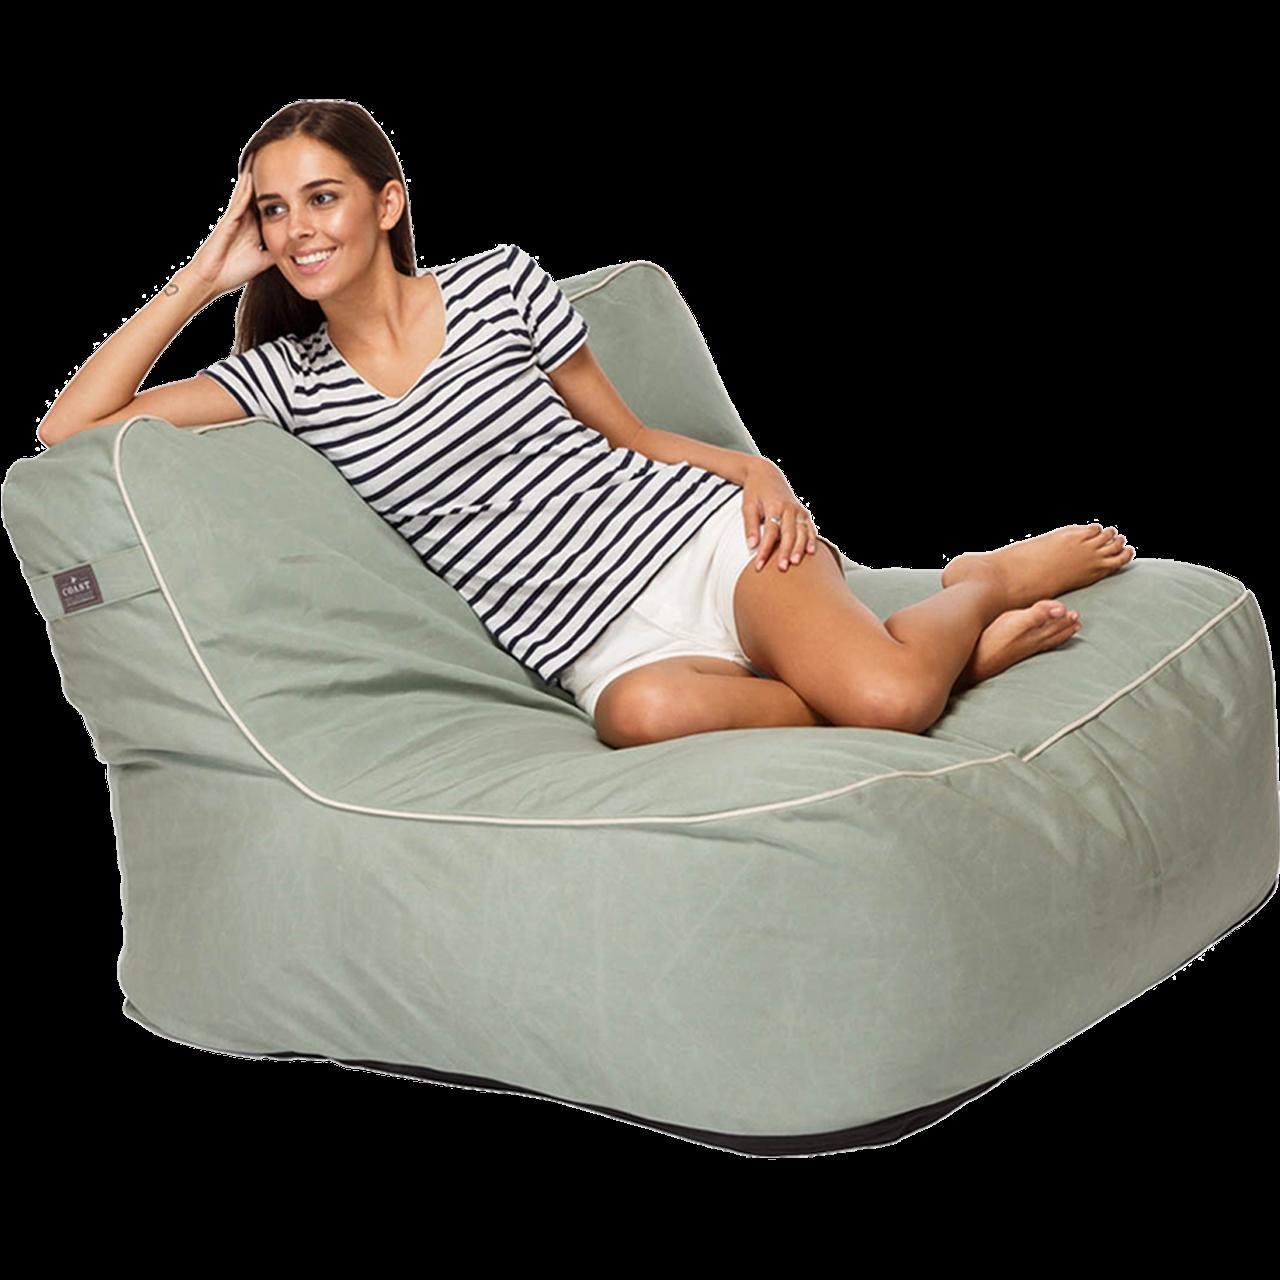 Groovy Isla Chair Machost Co Dining Chair Design Ideas Machostcouk